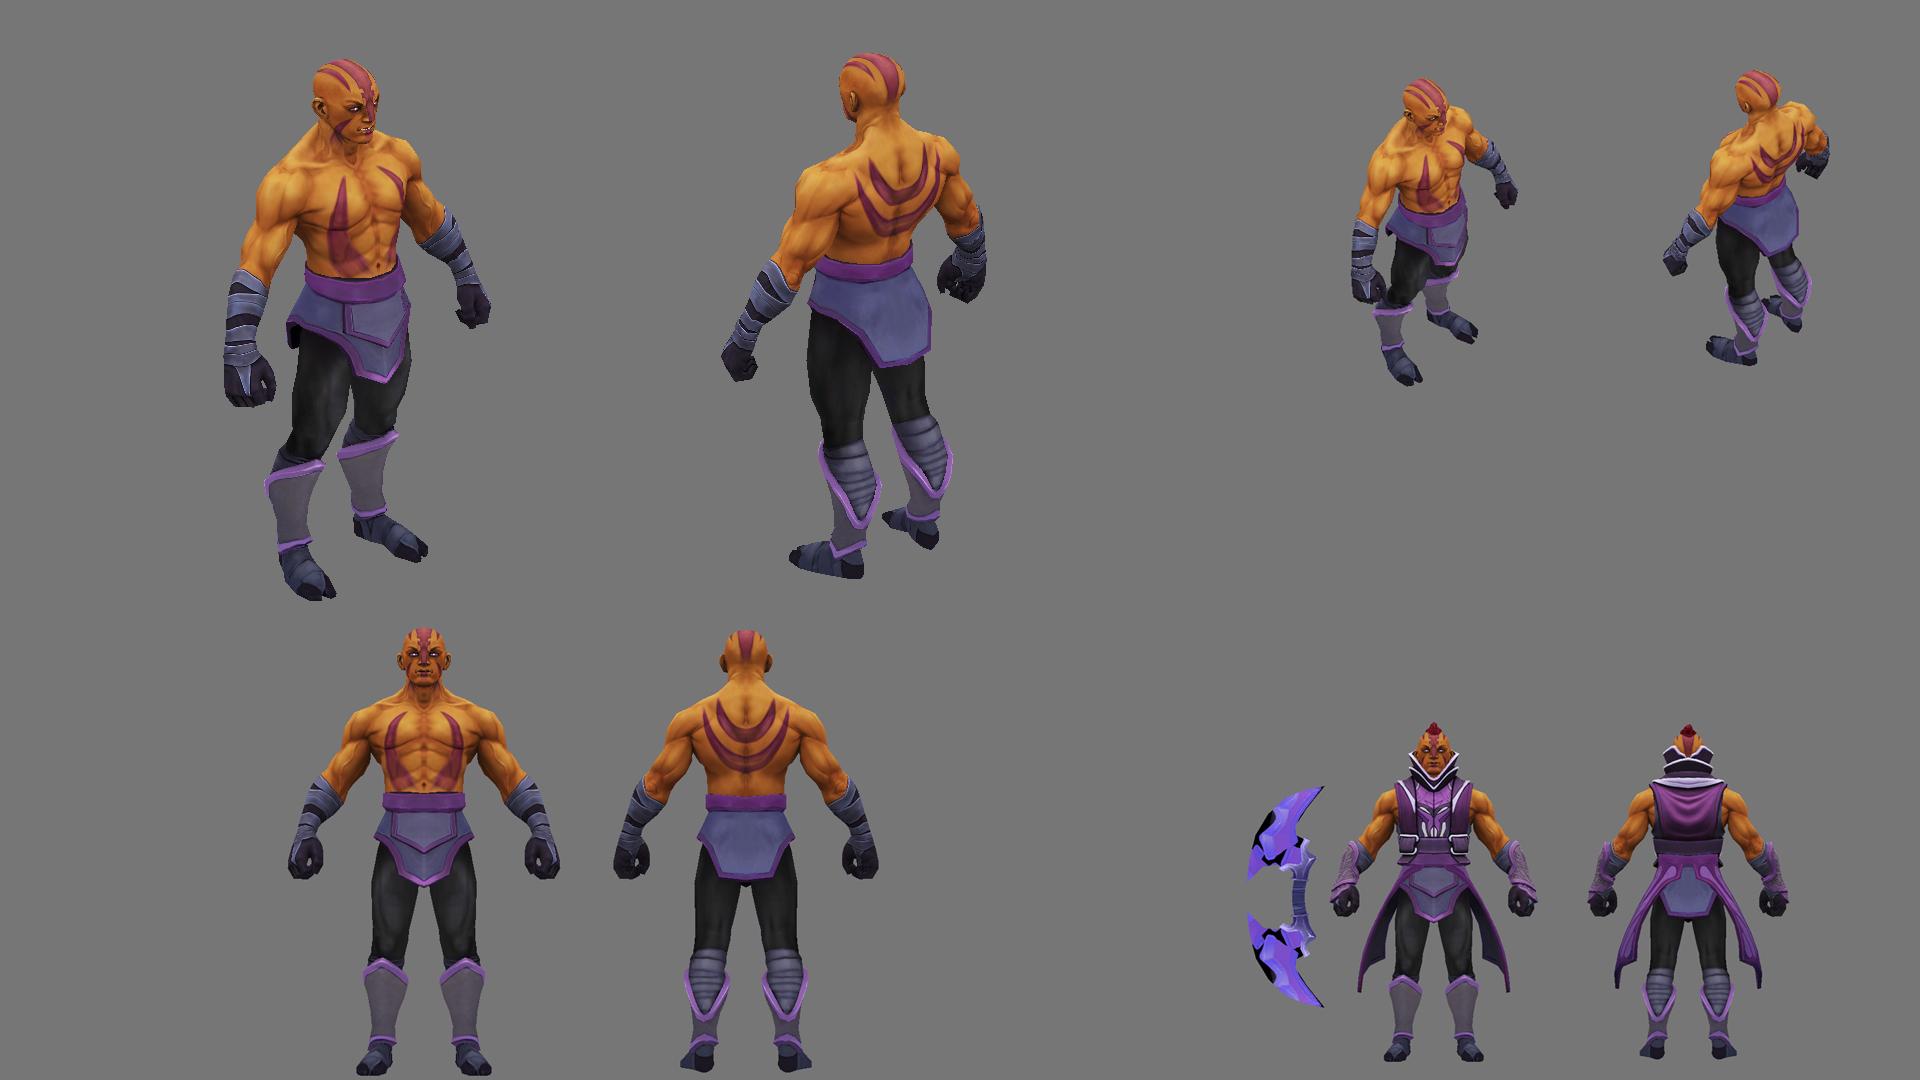 Dota 2 Character Design Pdf : Steam community guide dota hero concept sheets